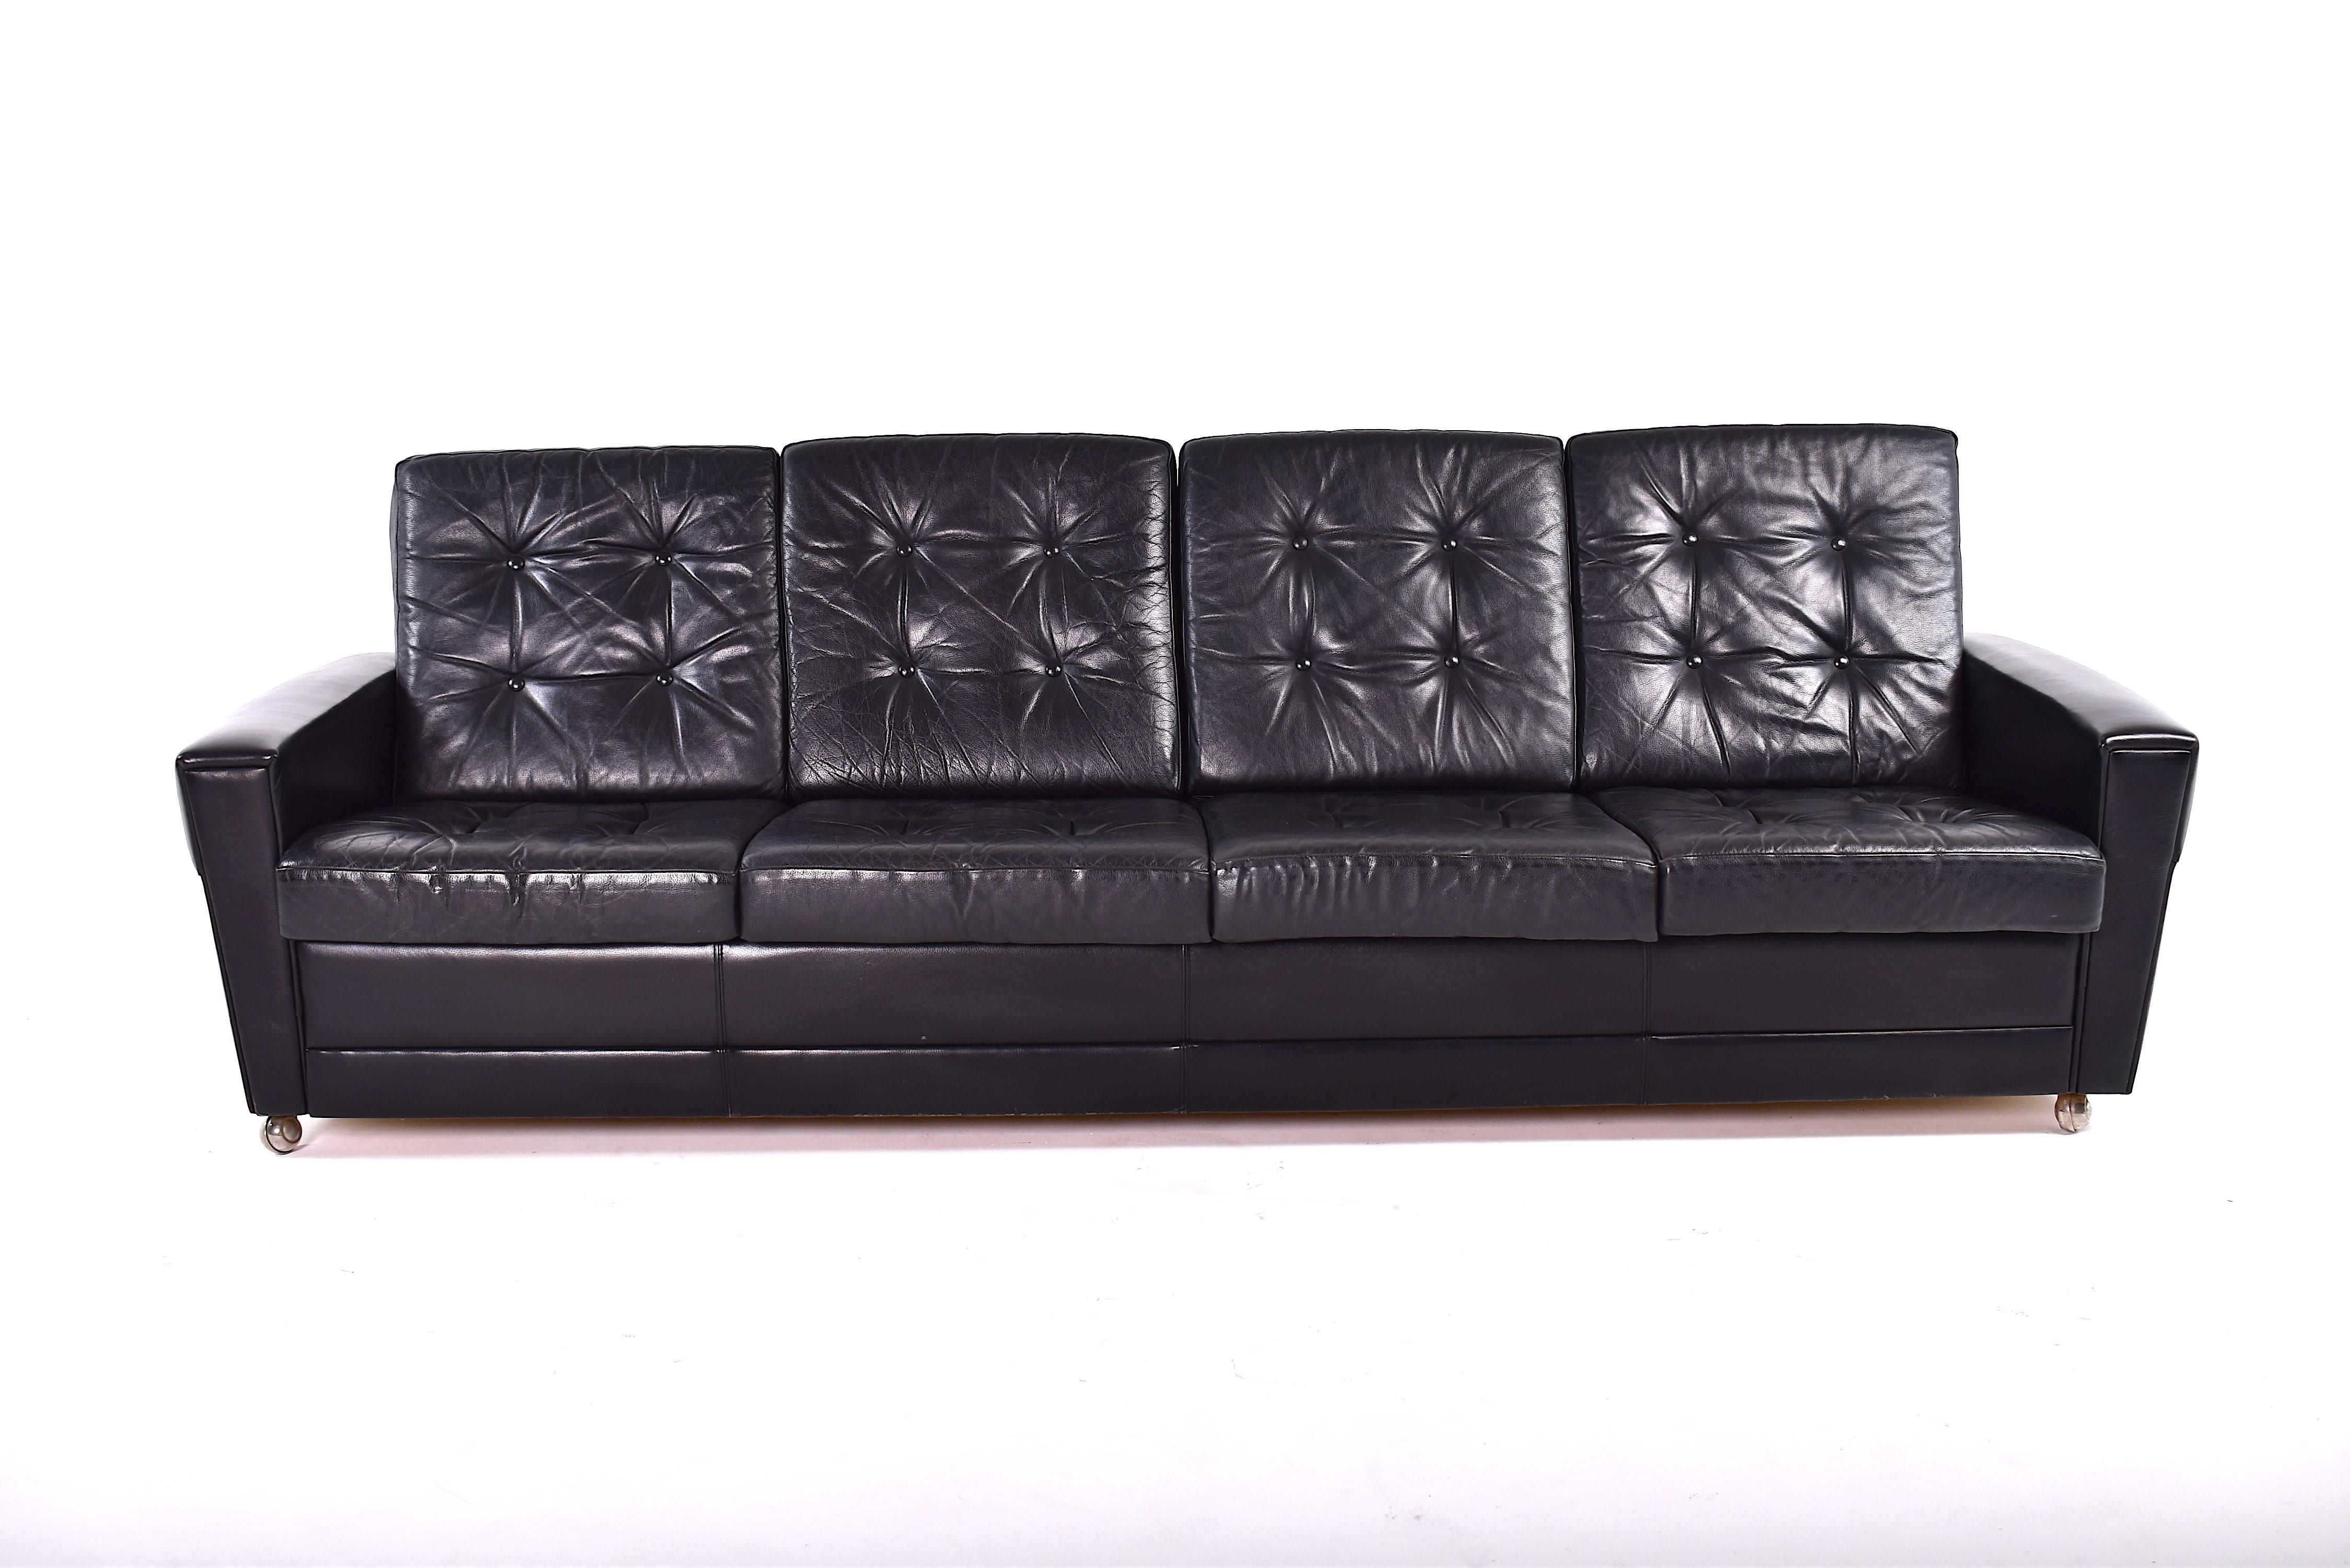 4 Seater Leather Mid Century Sofa 1960s